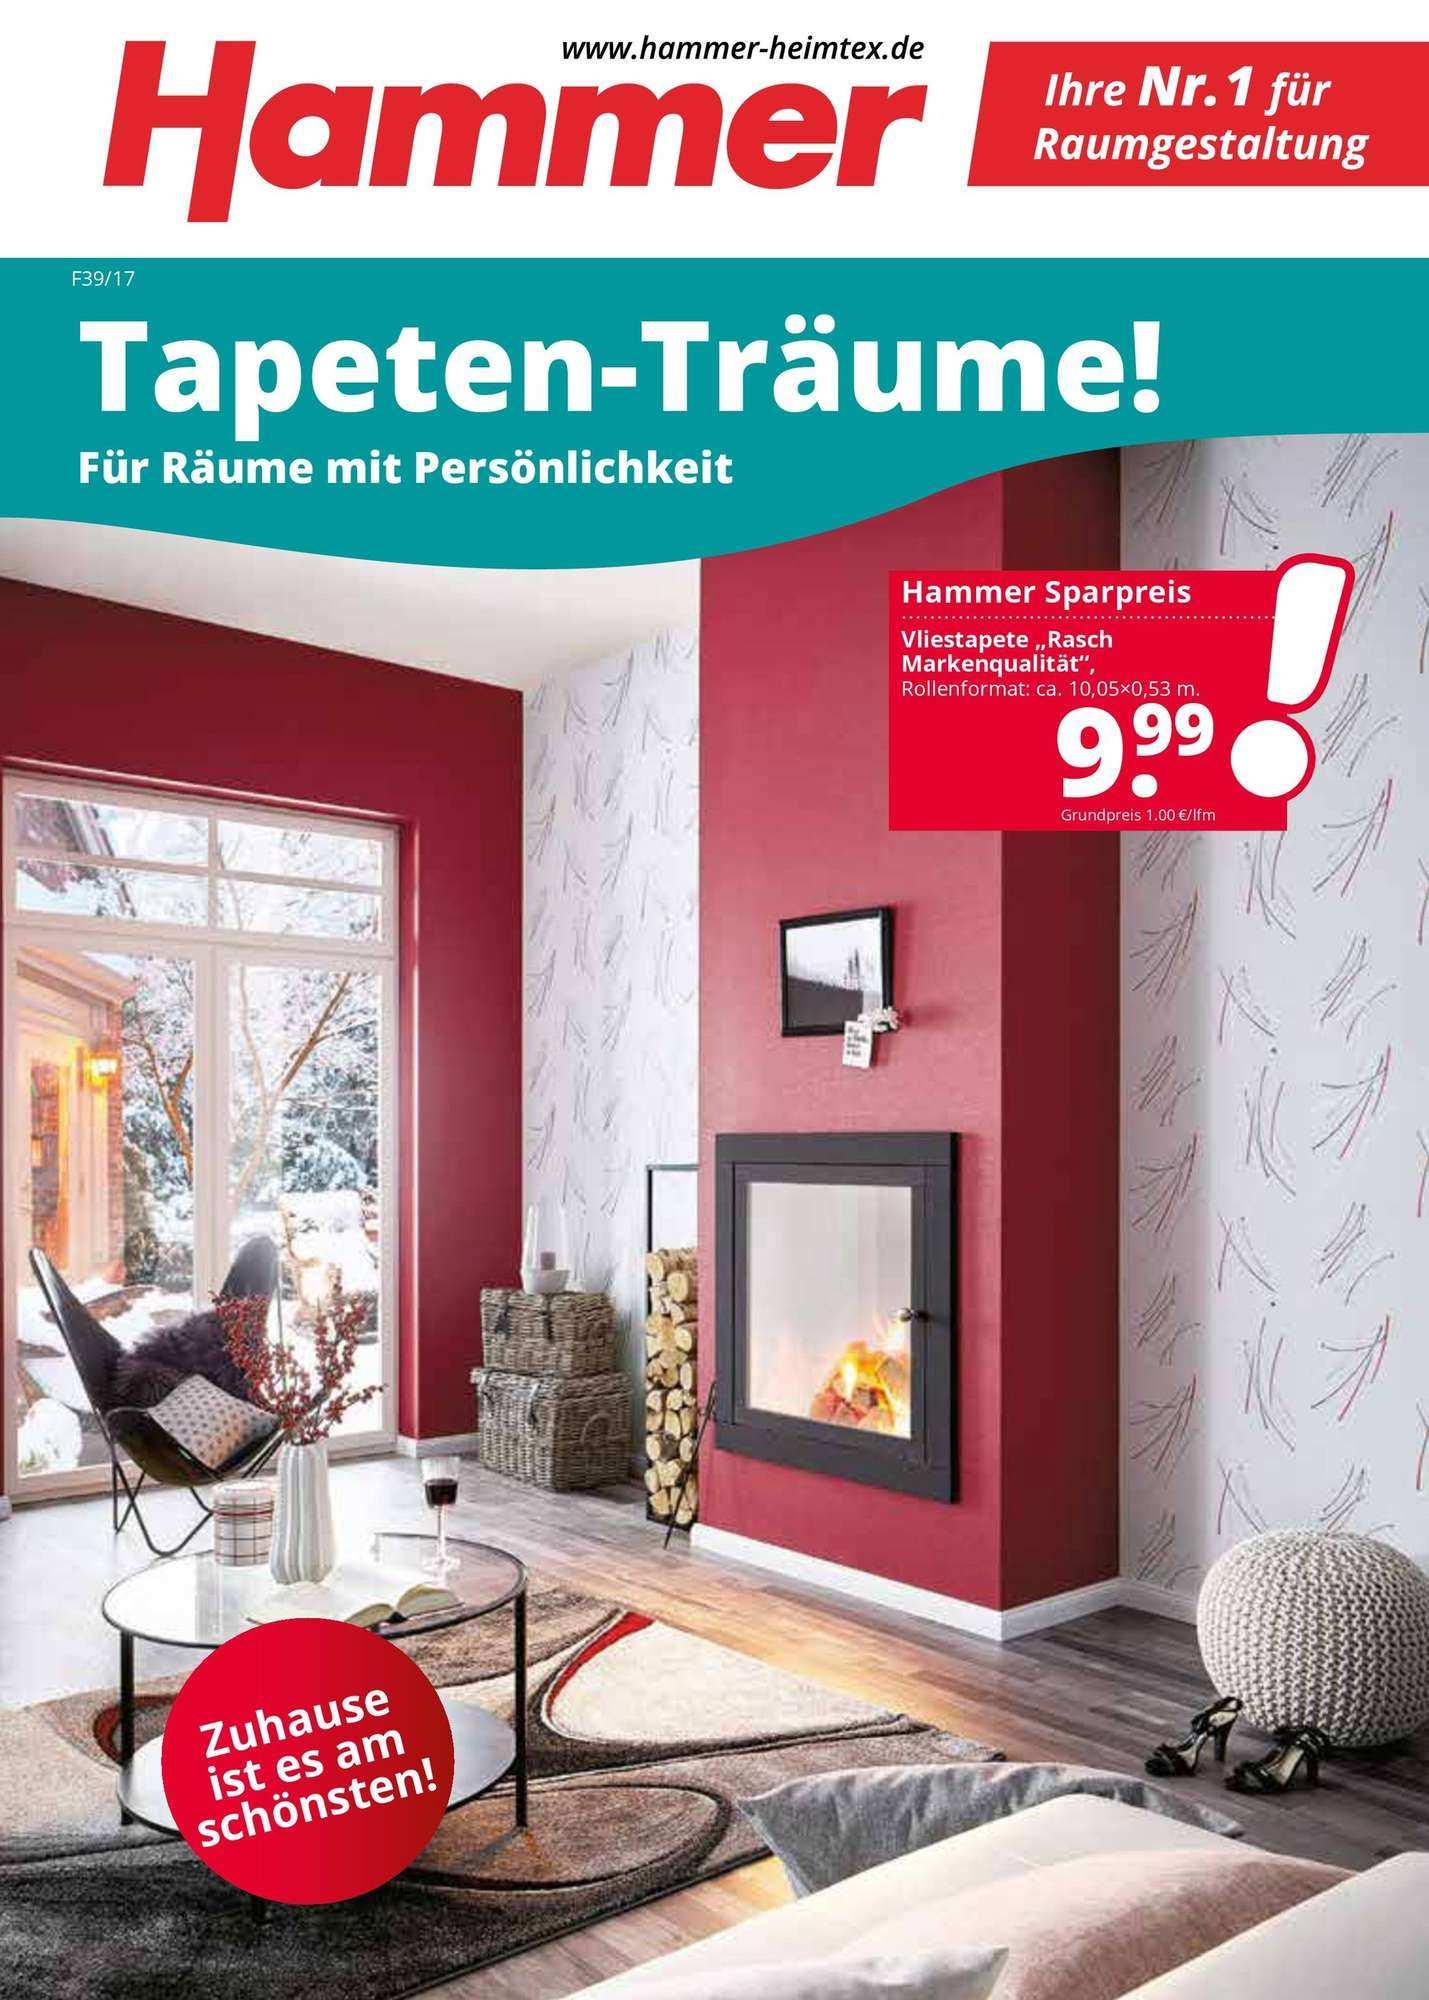 Hammer Tapeten Traume 29 09 2017 14 10 2017